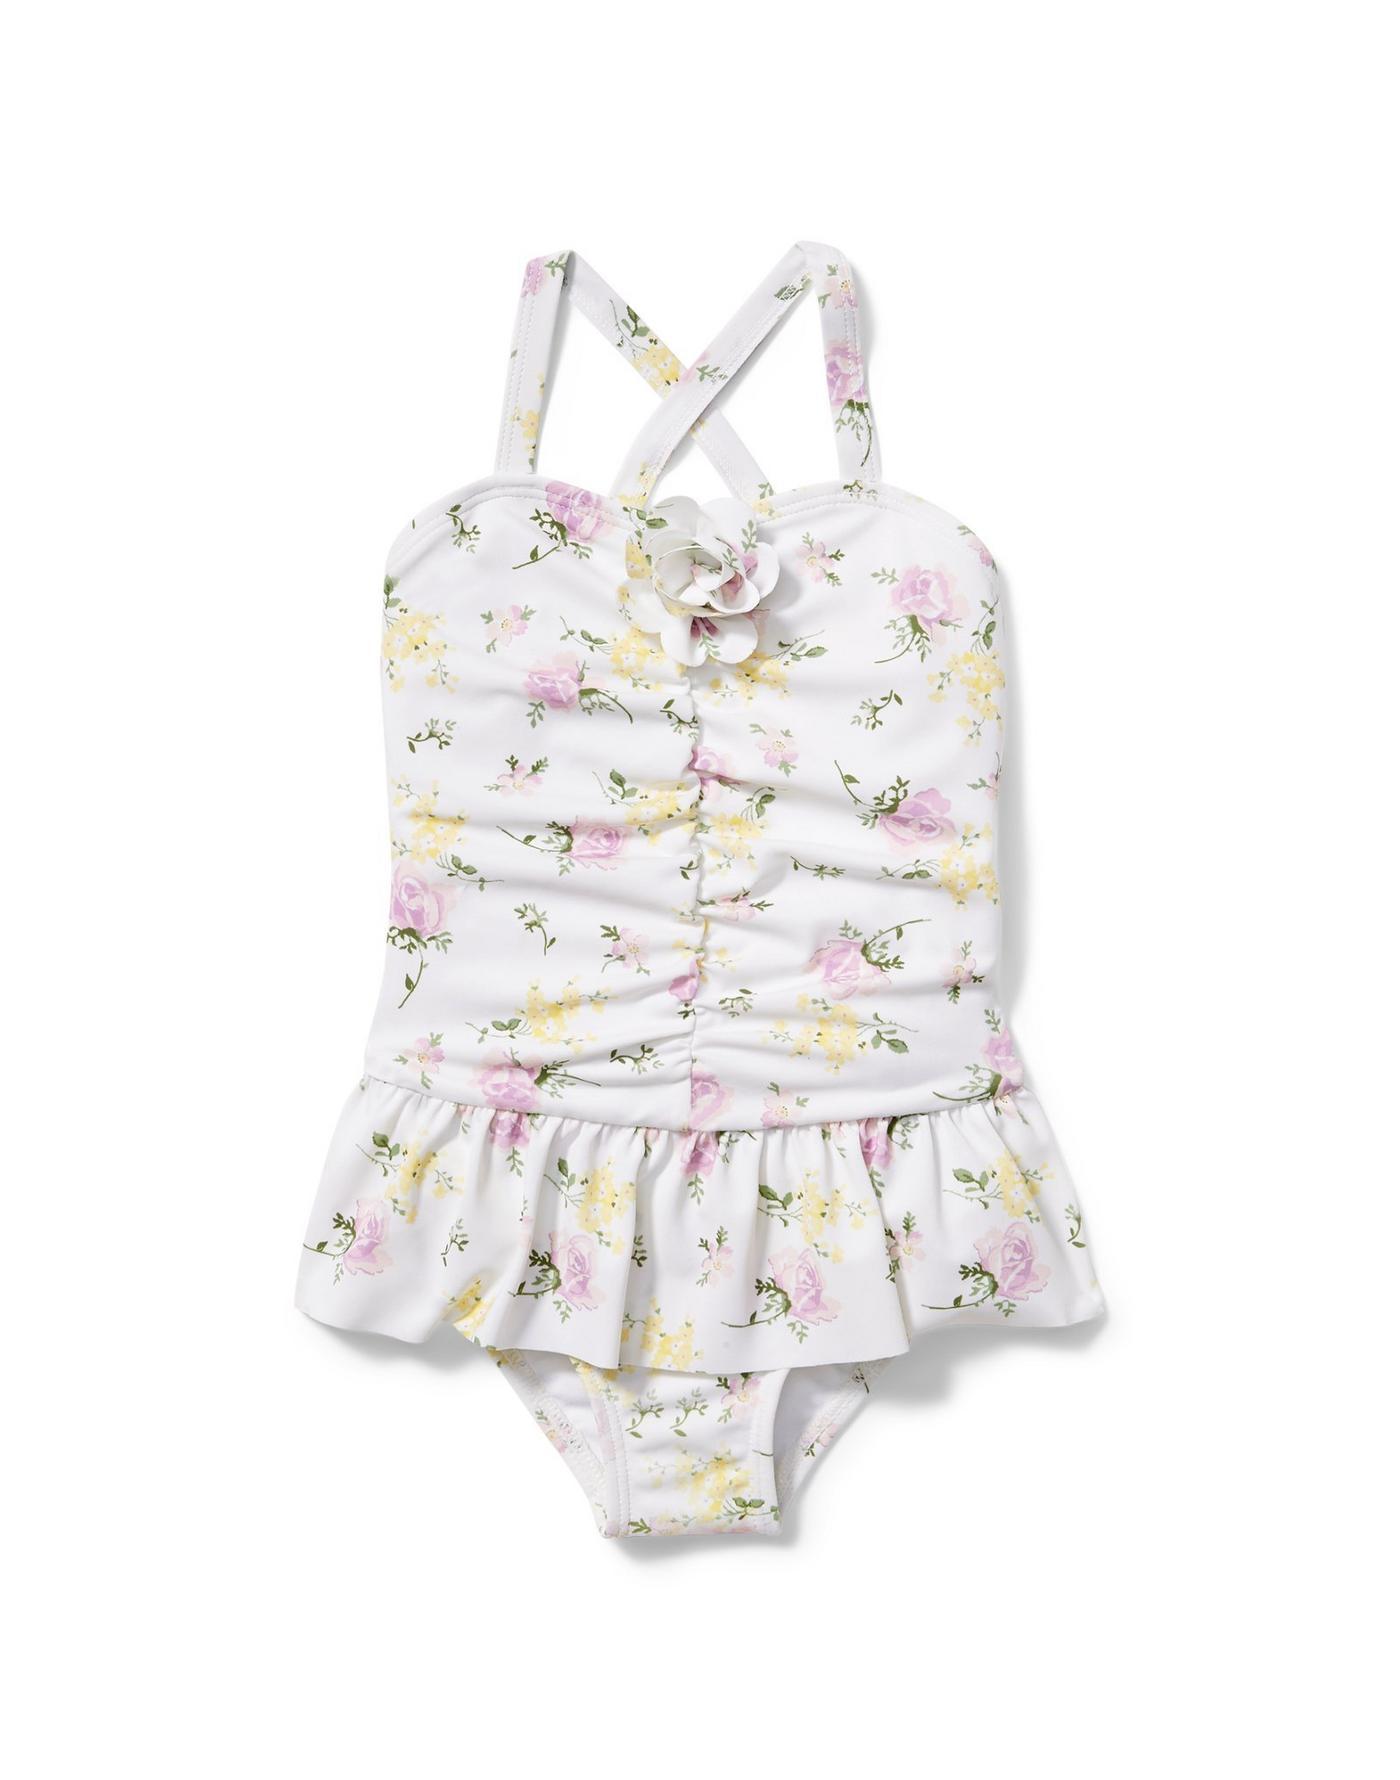 Juno Valentine Floral Swimsuit